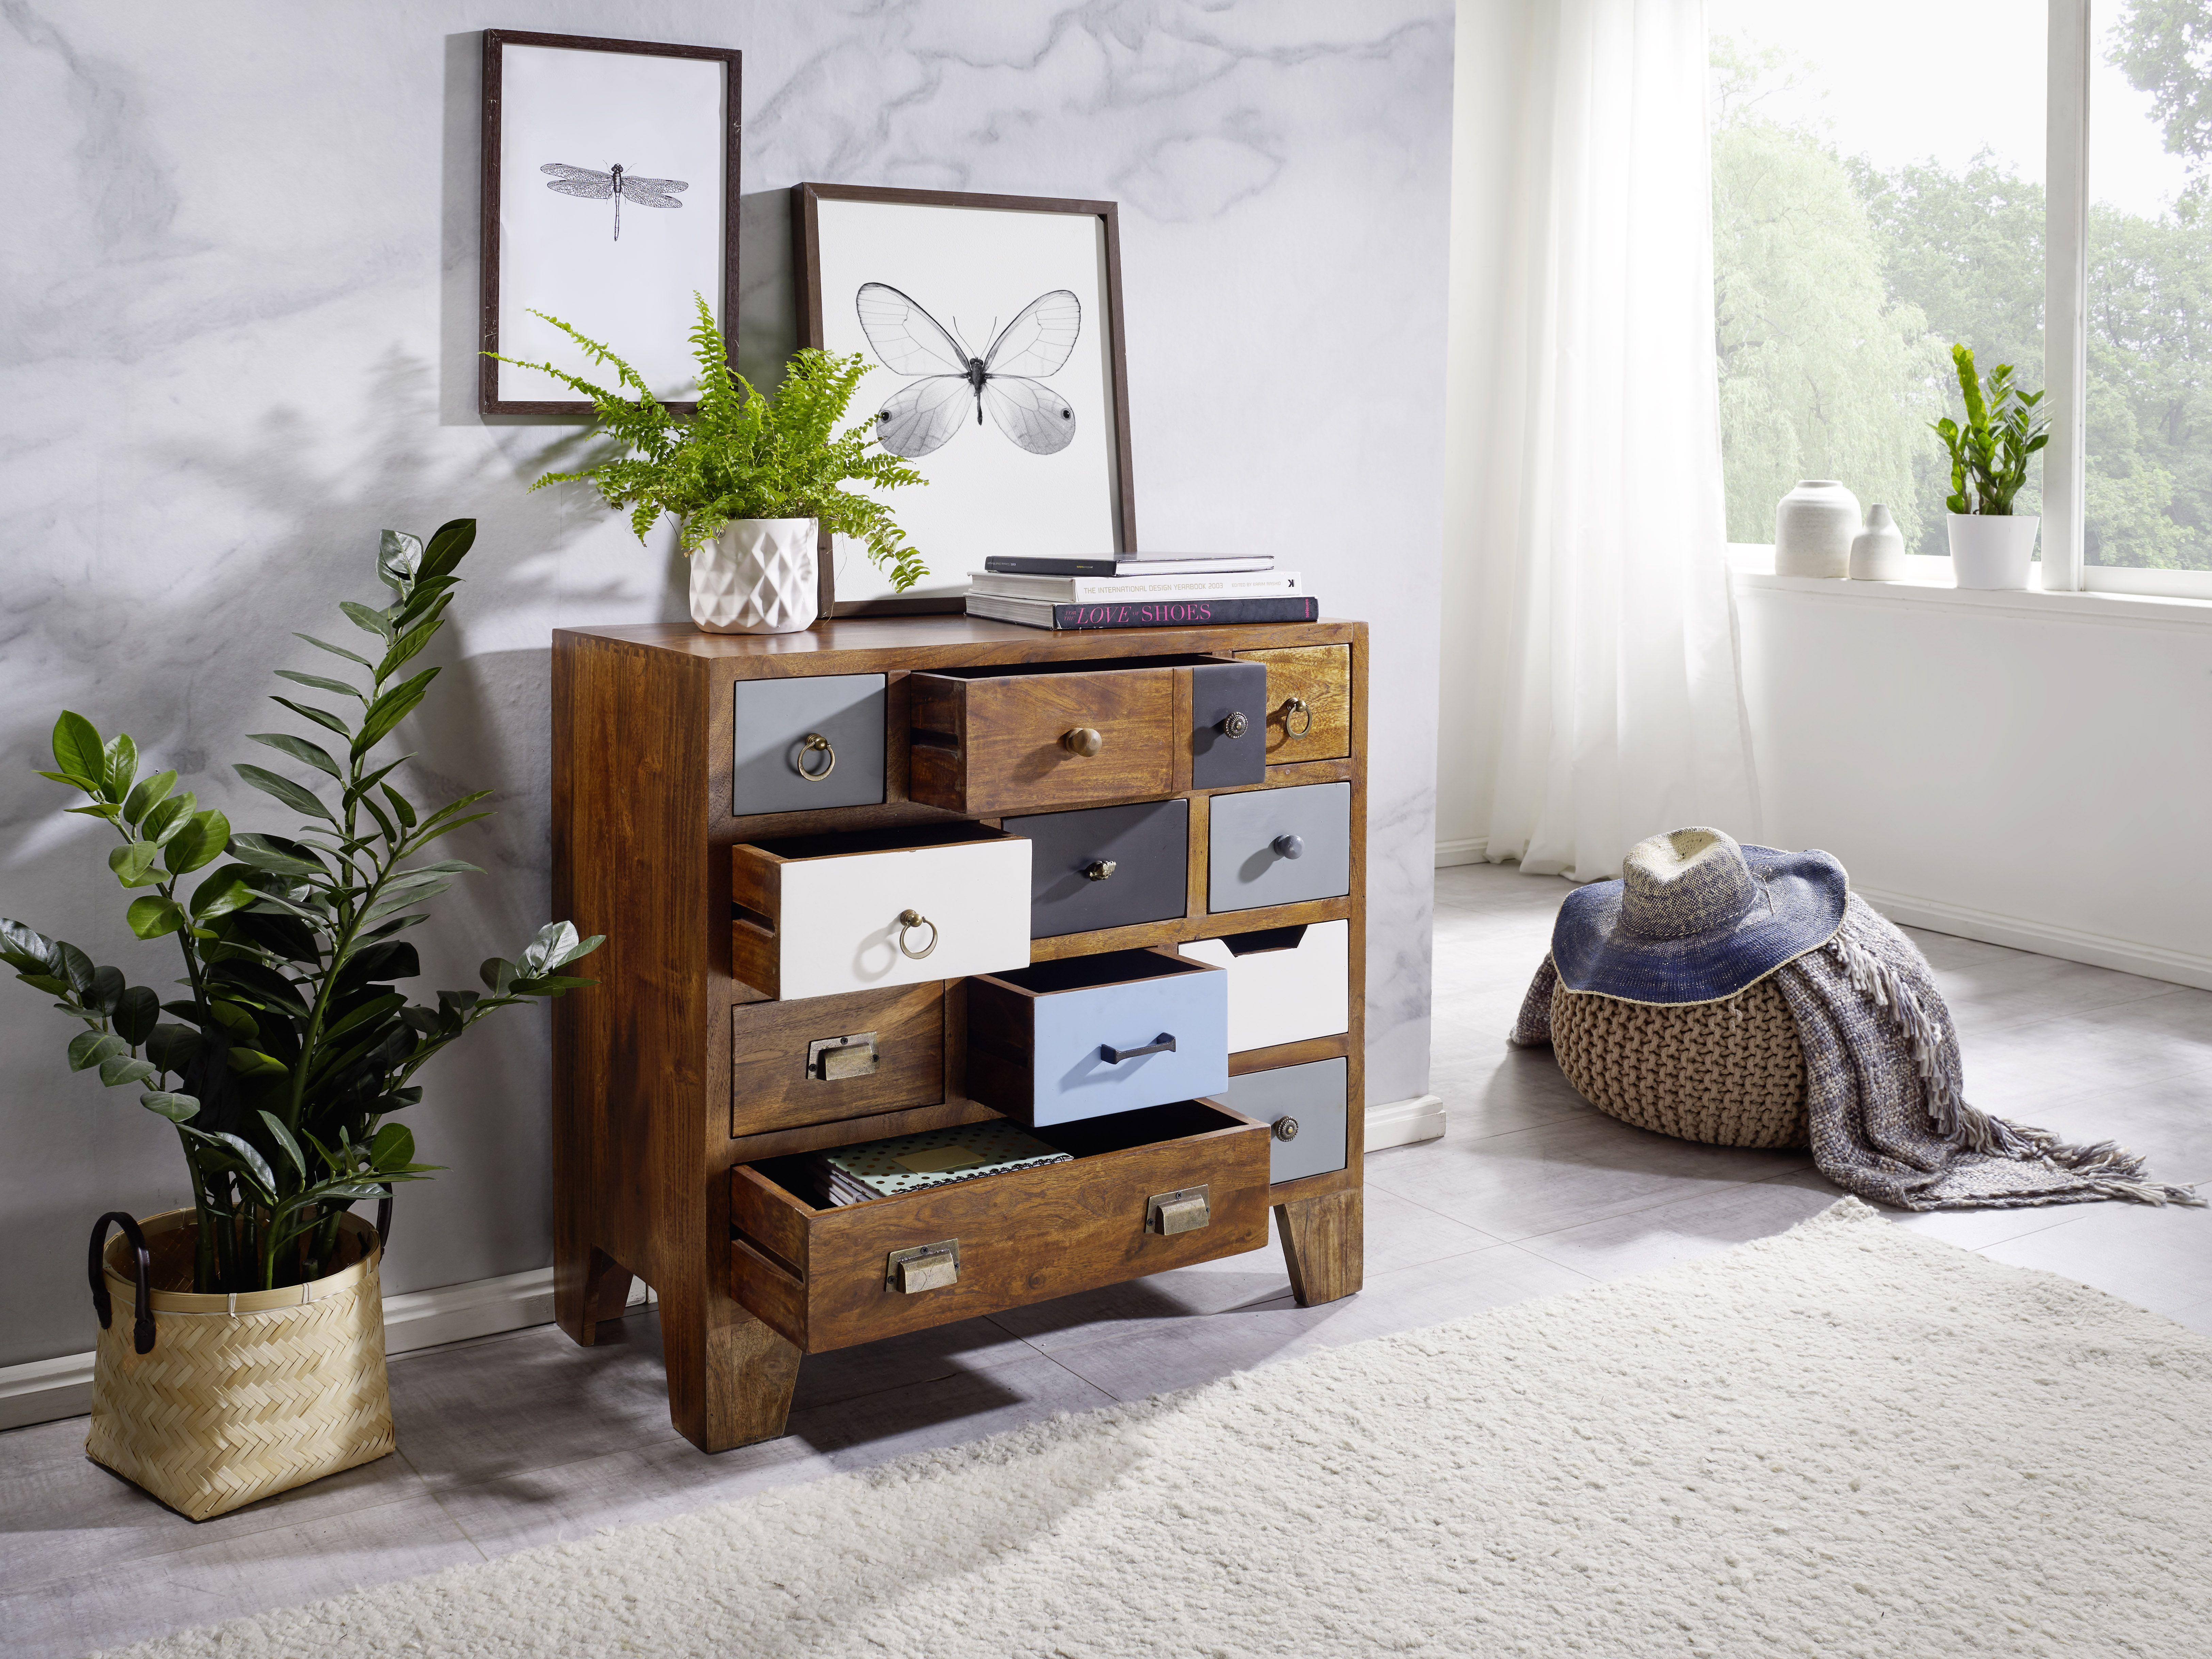 Esszimmer design bd wohnling sideboard x cm keona wl aus sheesham massivholz